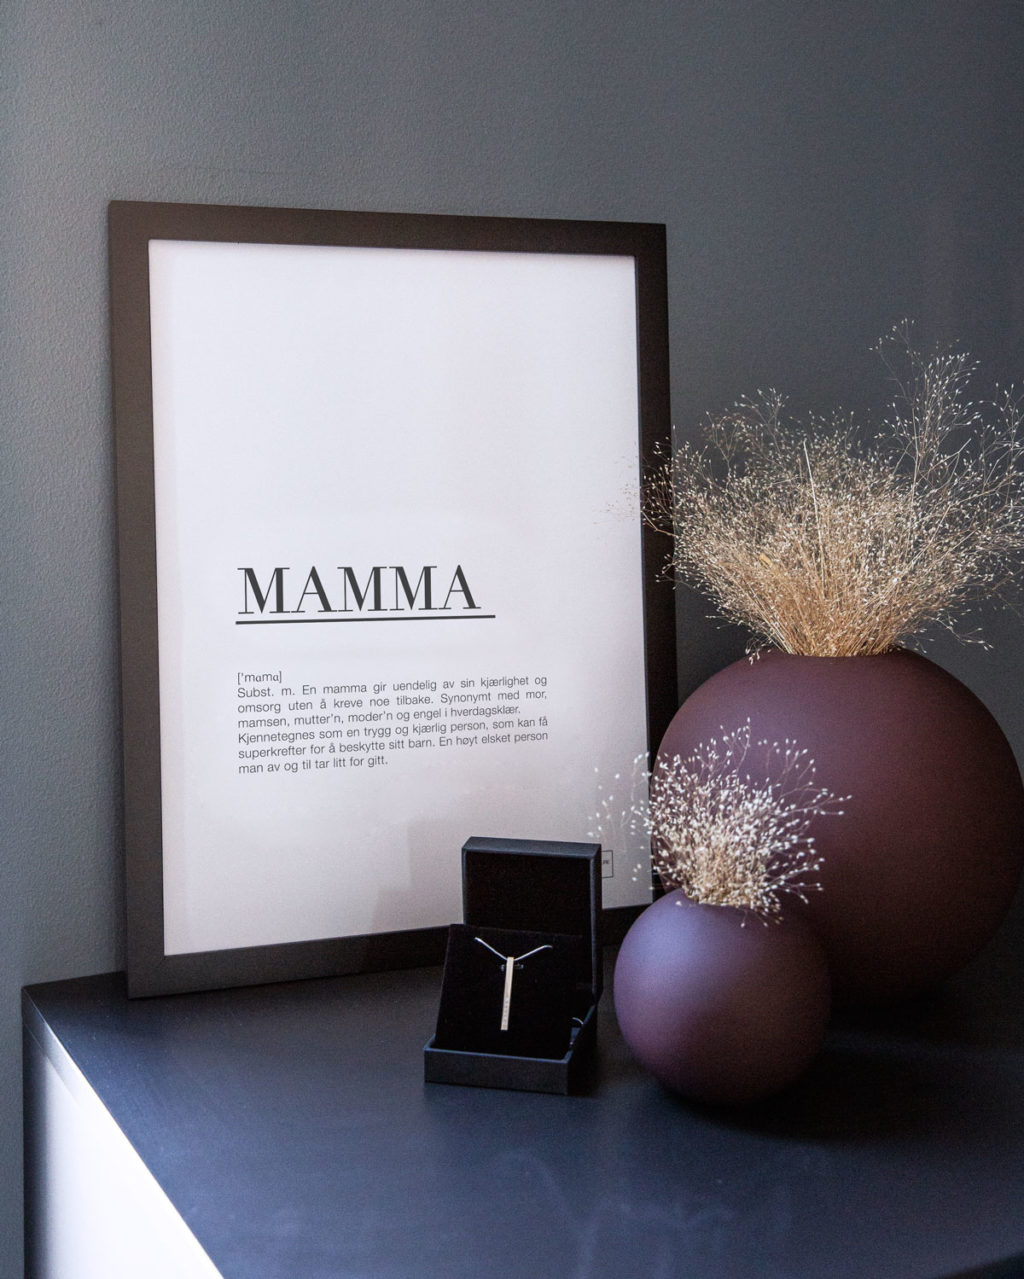 MAMMA stål smykke inkl. poster